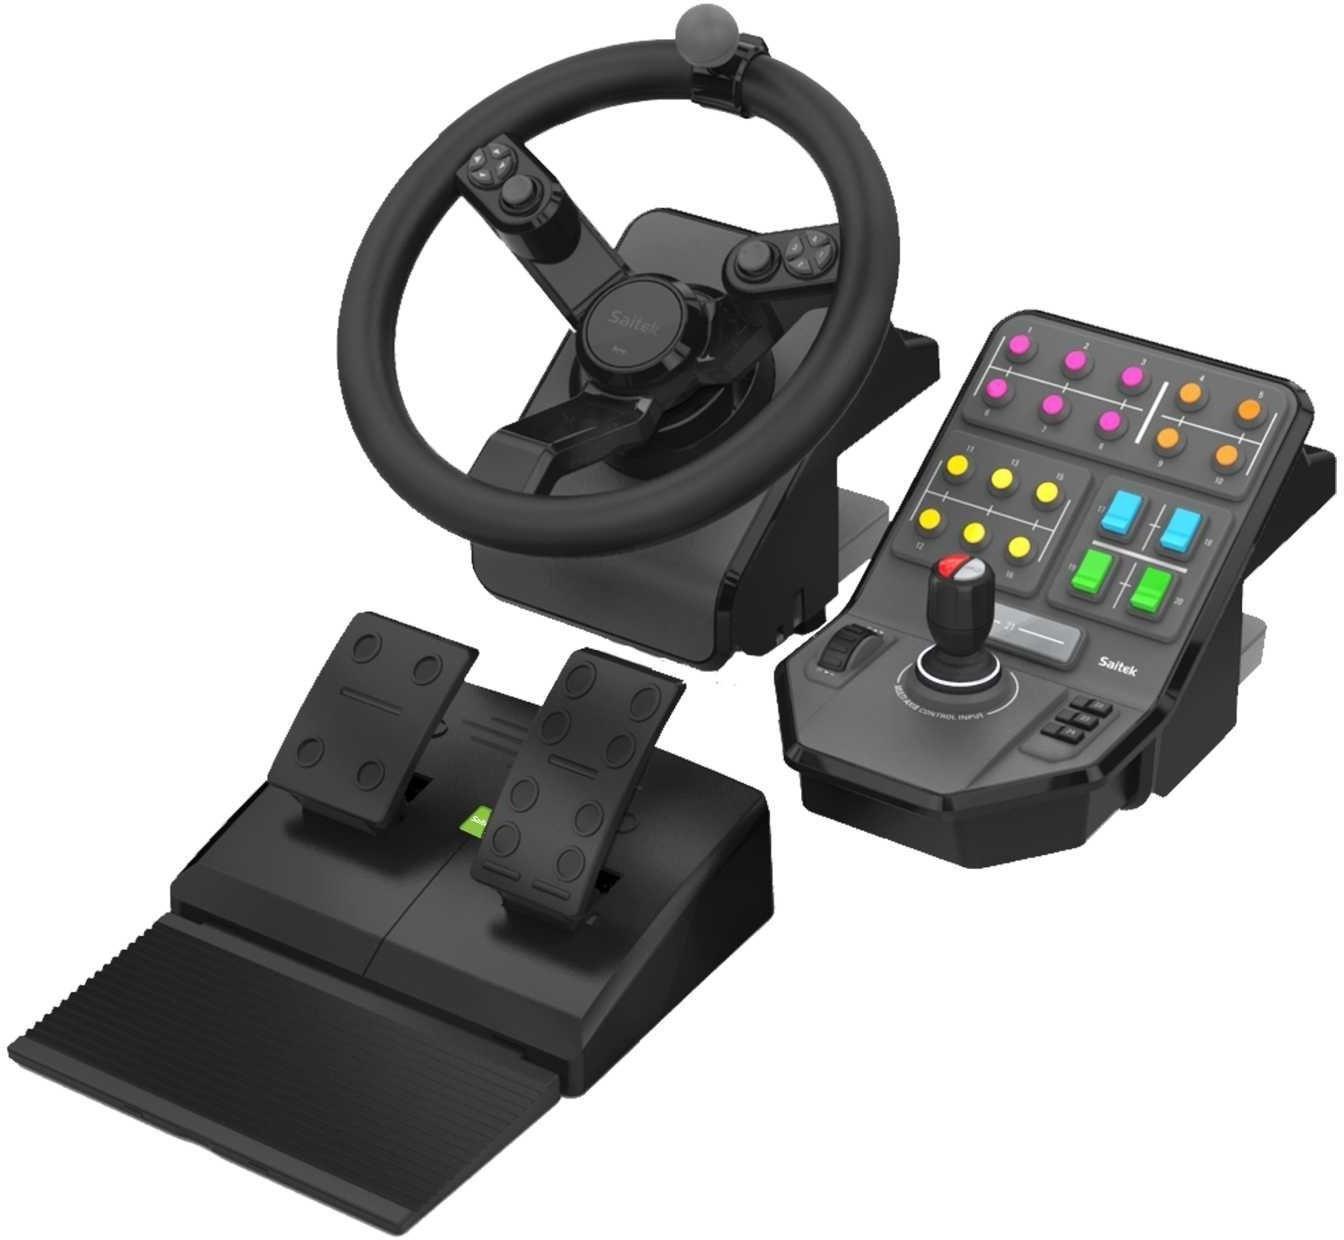 Gaming-Zubehör: z.B. Logitech G Farming Simulator Controller Bundle - 139€ | Logitech G502 Proteus Spectrum Maus - 37€ | Z333 Boxen - 29€